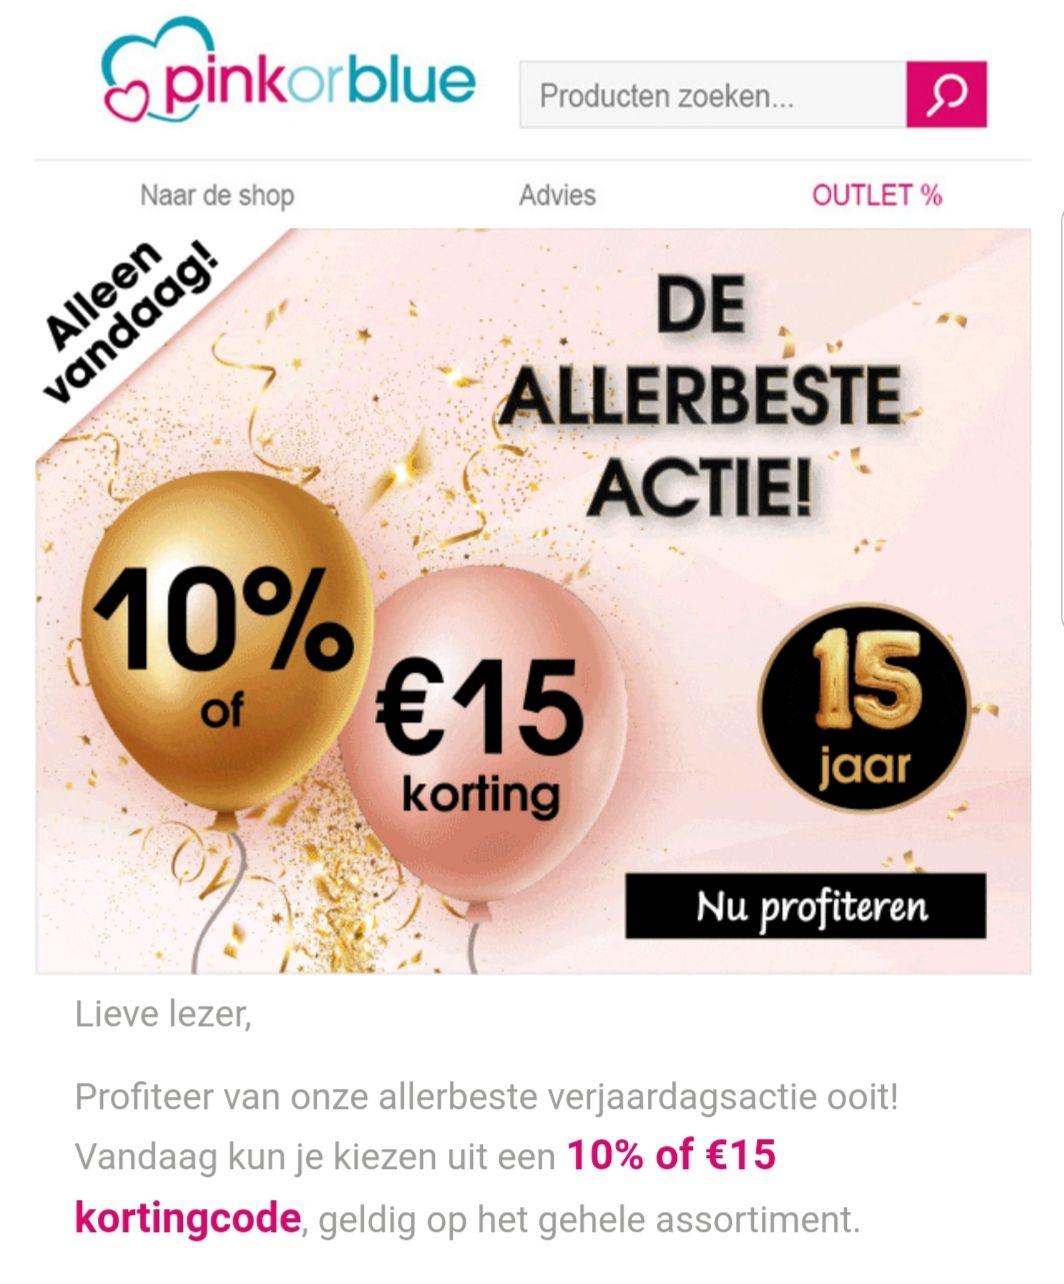 Pinkorblue 10% of 15euro korting